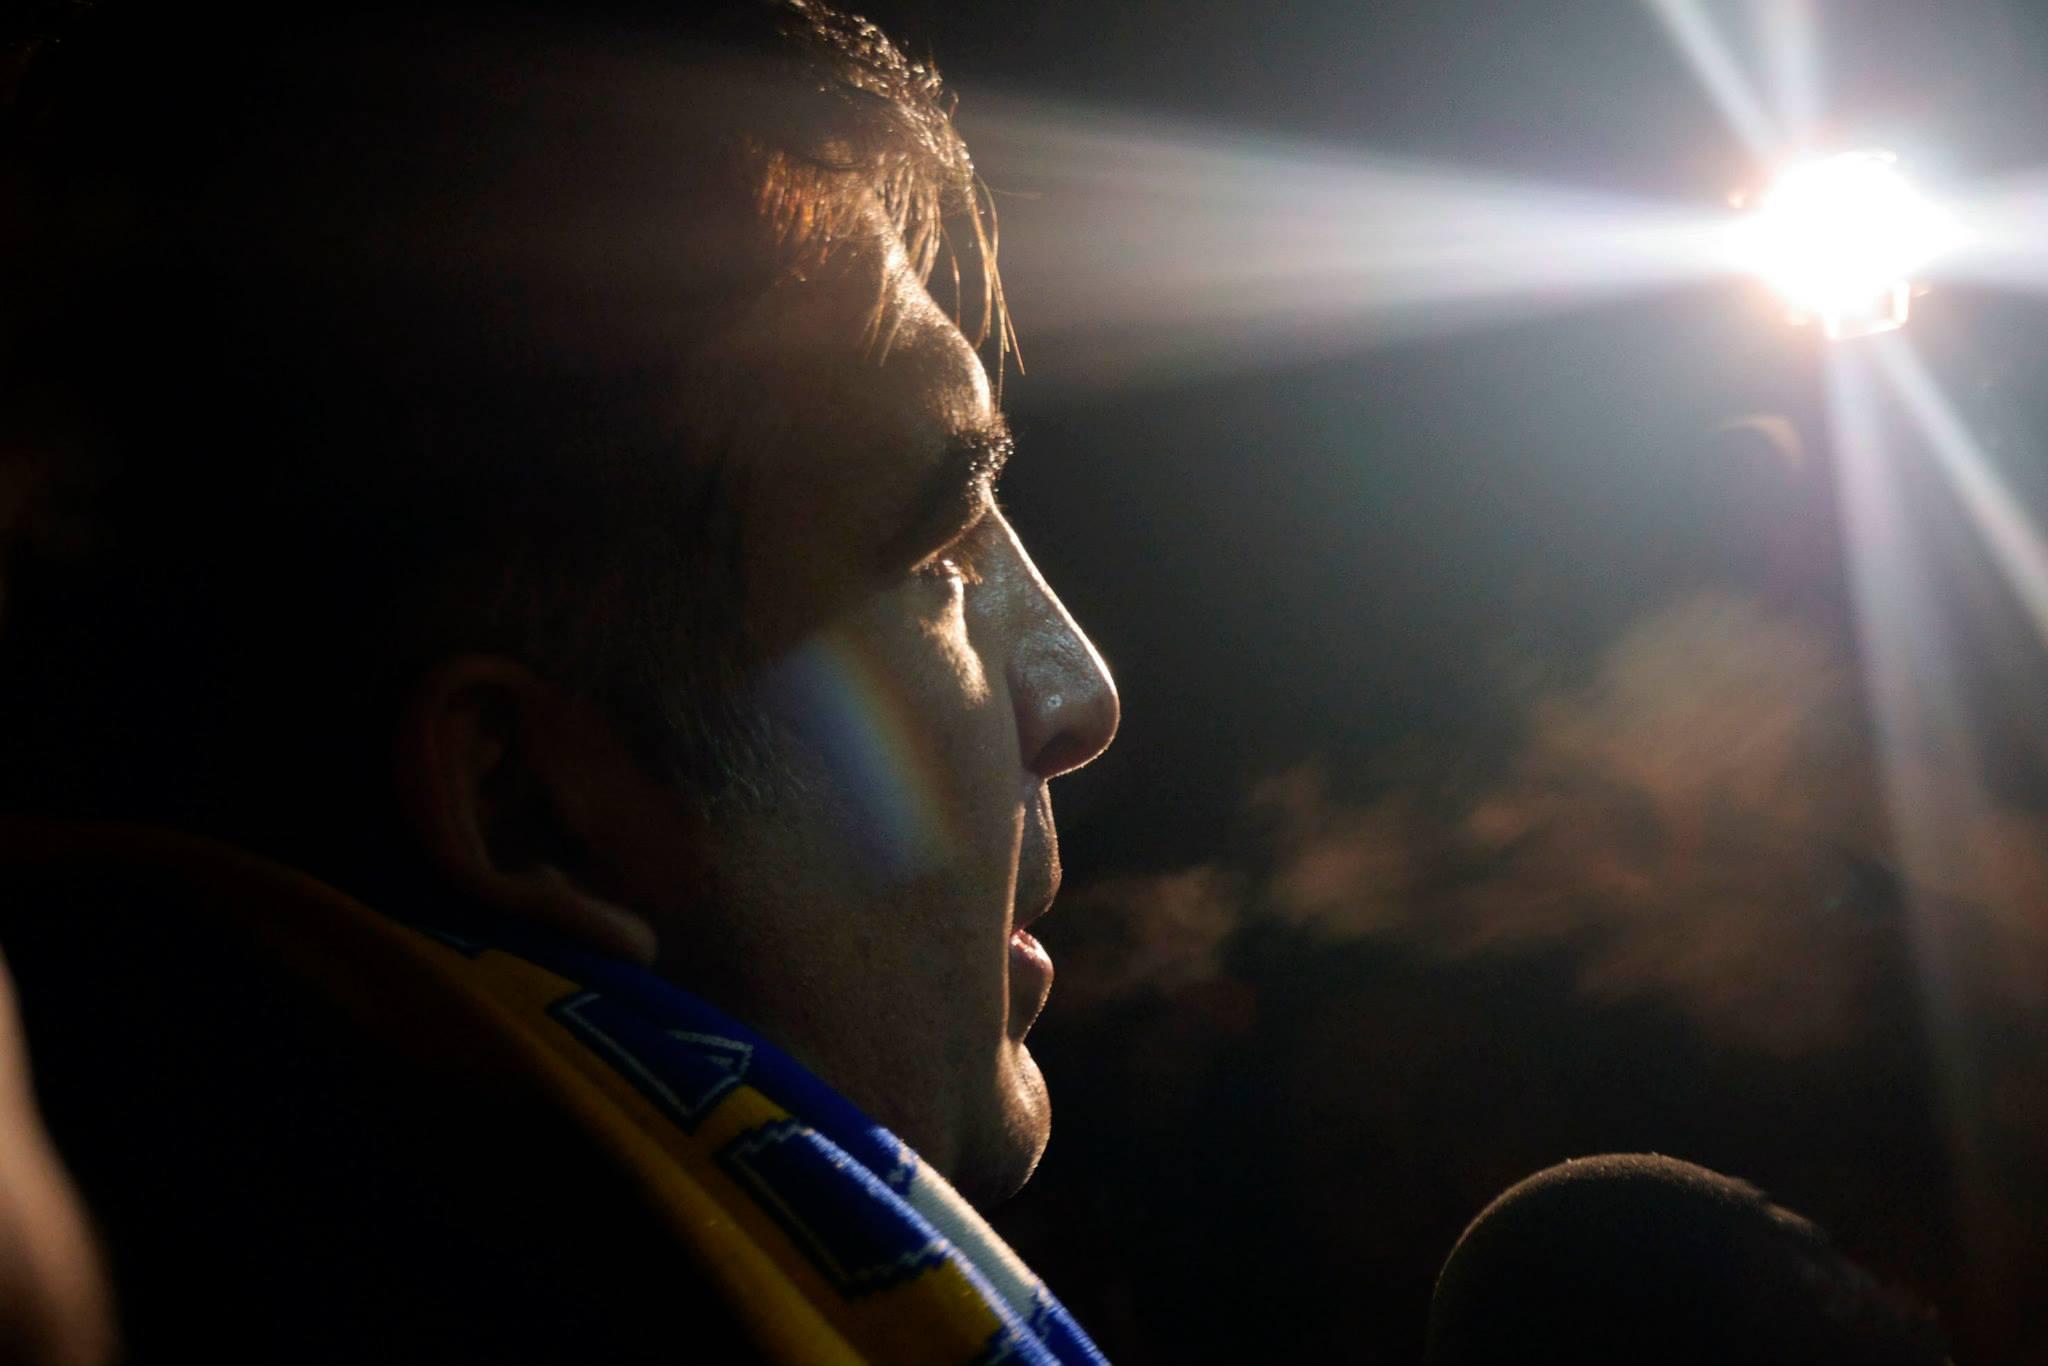 Mikhail Saakashvili 43 #новости возвращение Саакашвили, выборы-2021, Михаил Саакашвили, Ника Мелия